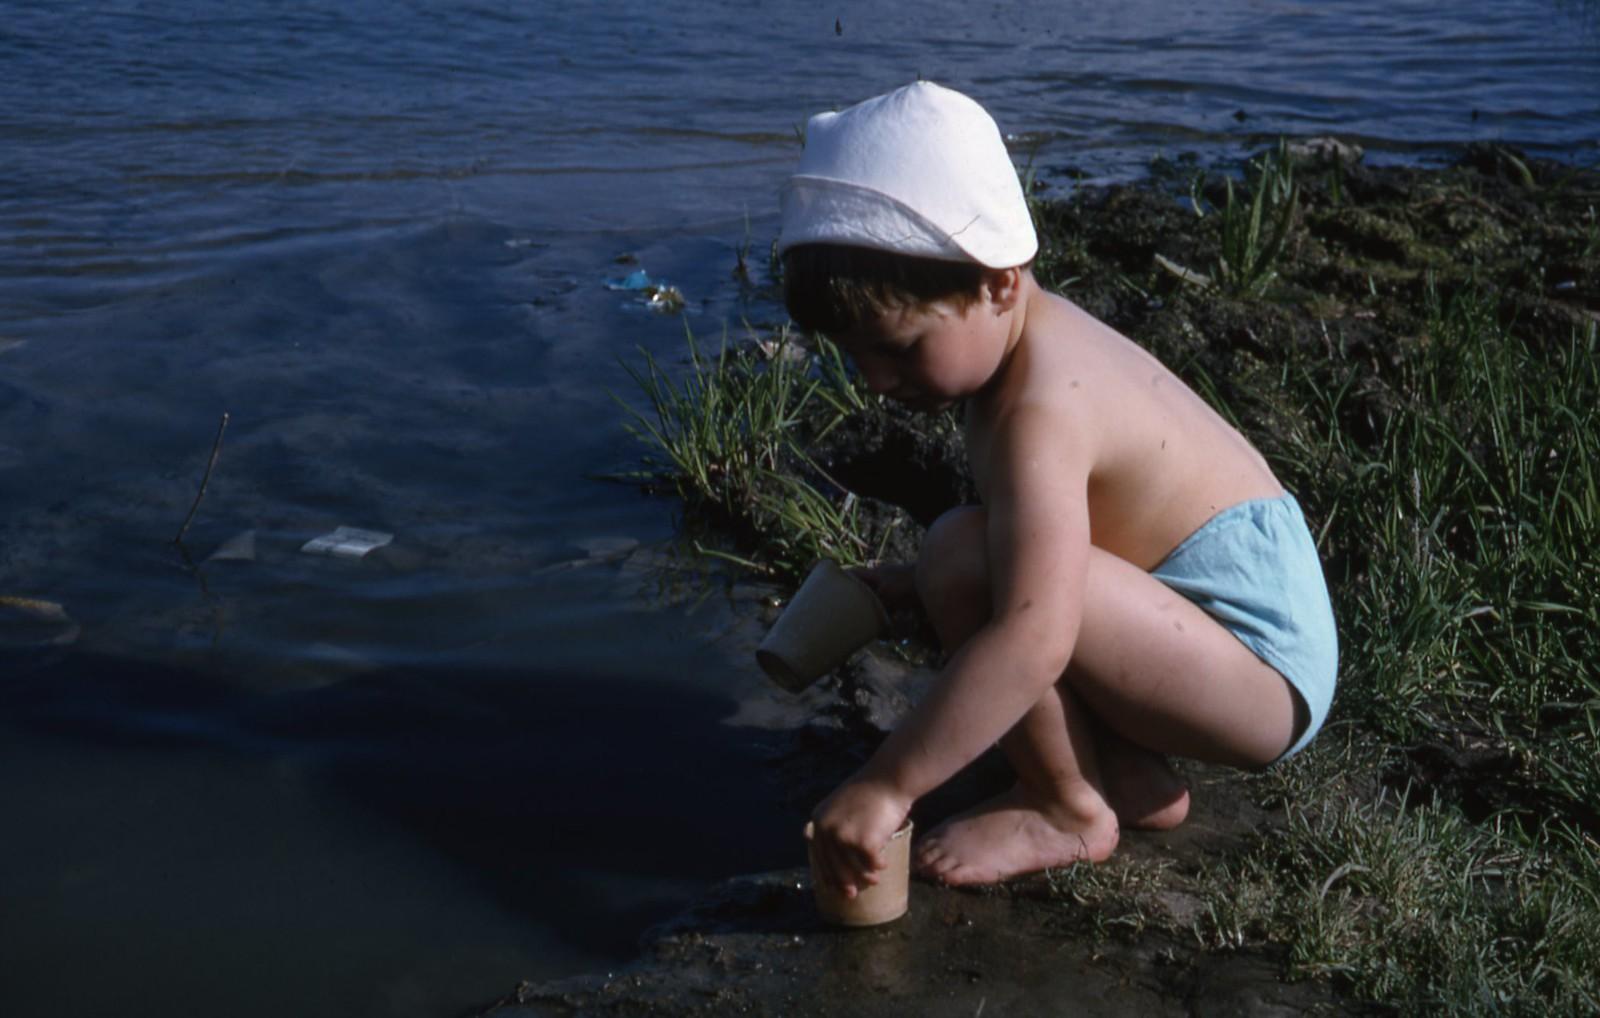 hammond-MA10-Ostankino-people-sunbathing-and-fishing-008